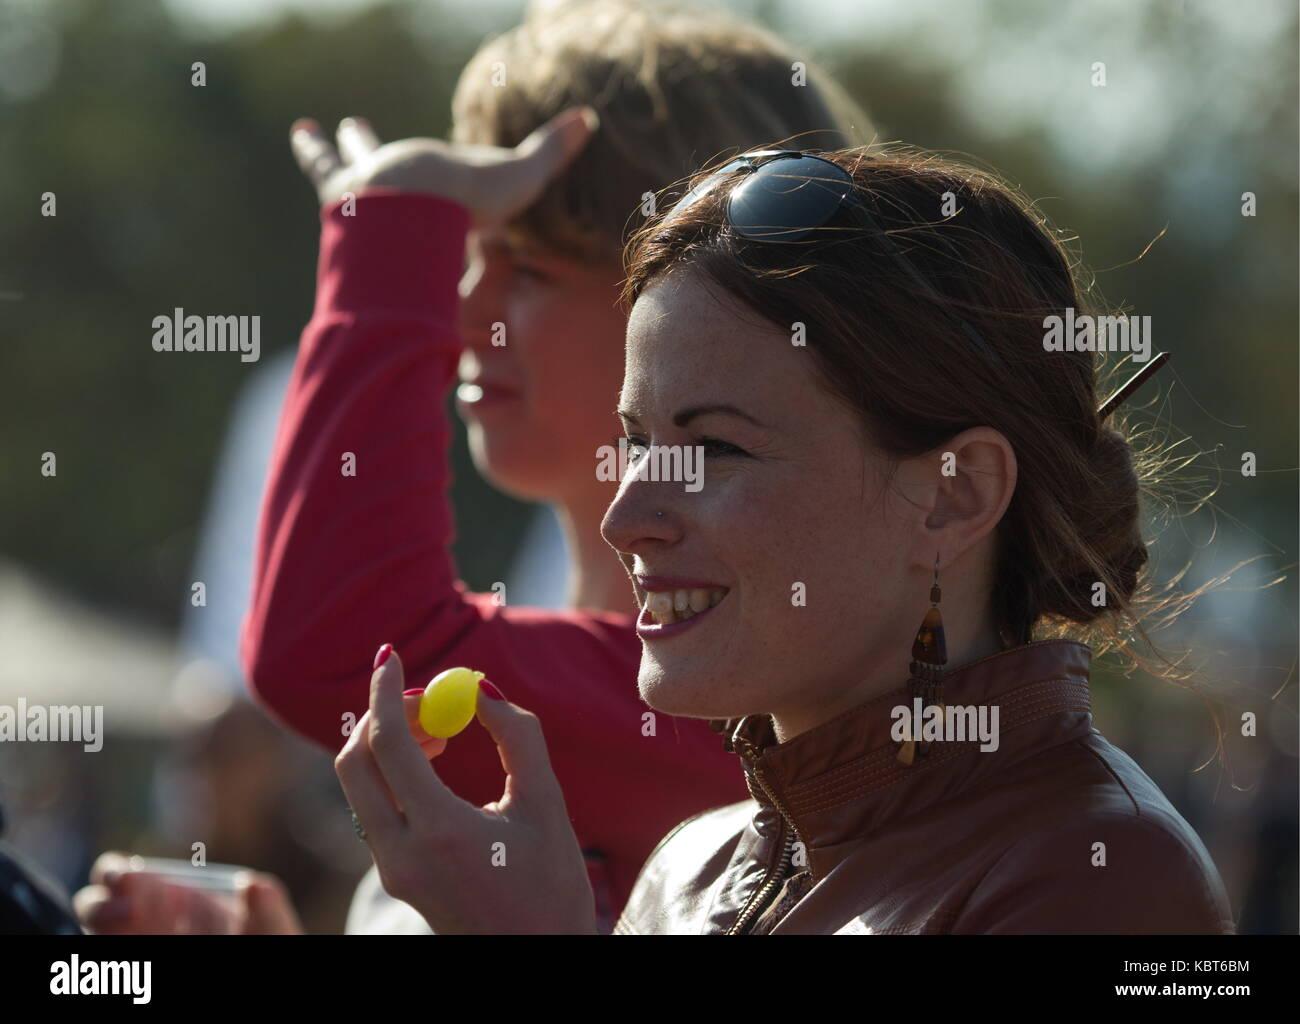 Crimea, Russia. 30th Sep, 2017. People attend the WineFest grape harvesting and wine making festival at the Zolotaya Balka winery in the city of Balaklava. Credit: Sergei Malgavko/TASS/Alamy Live News Stock Photo